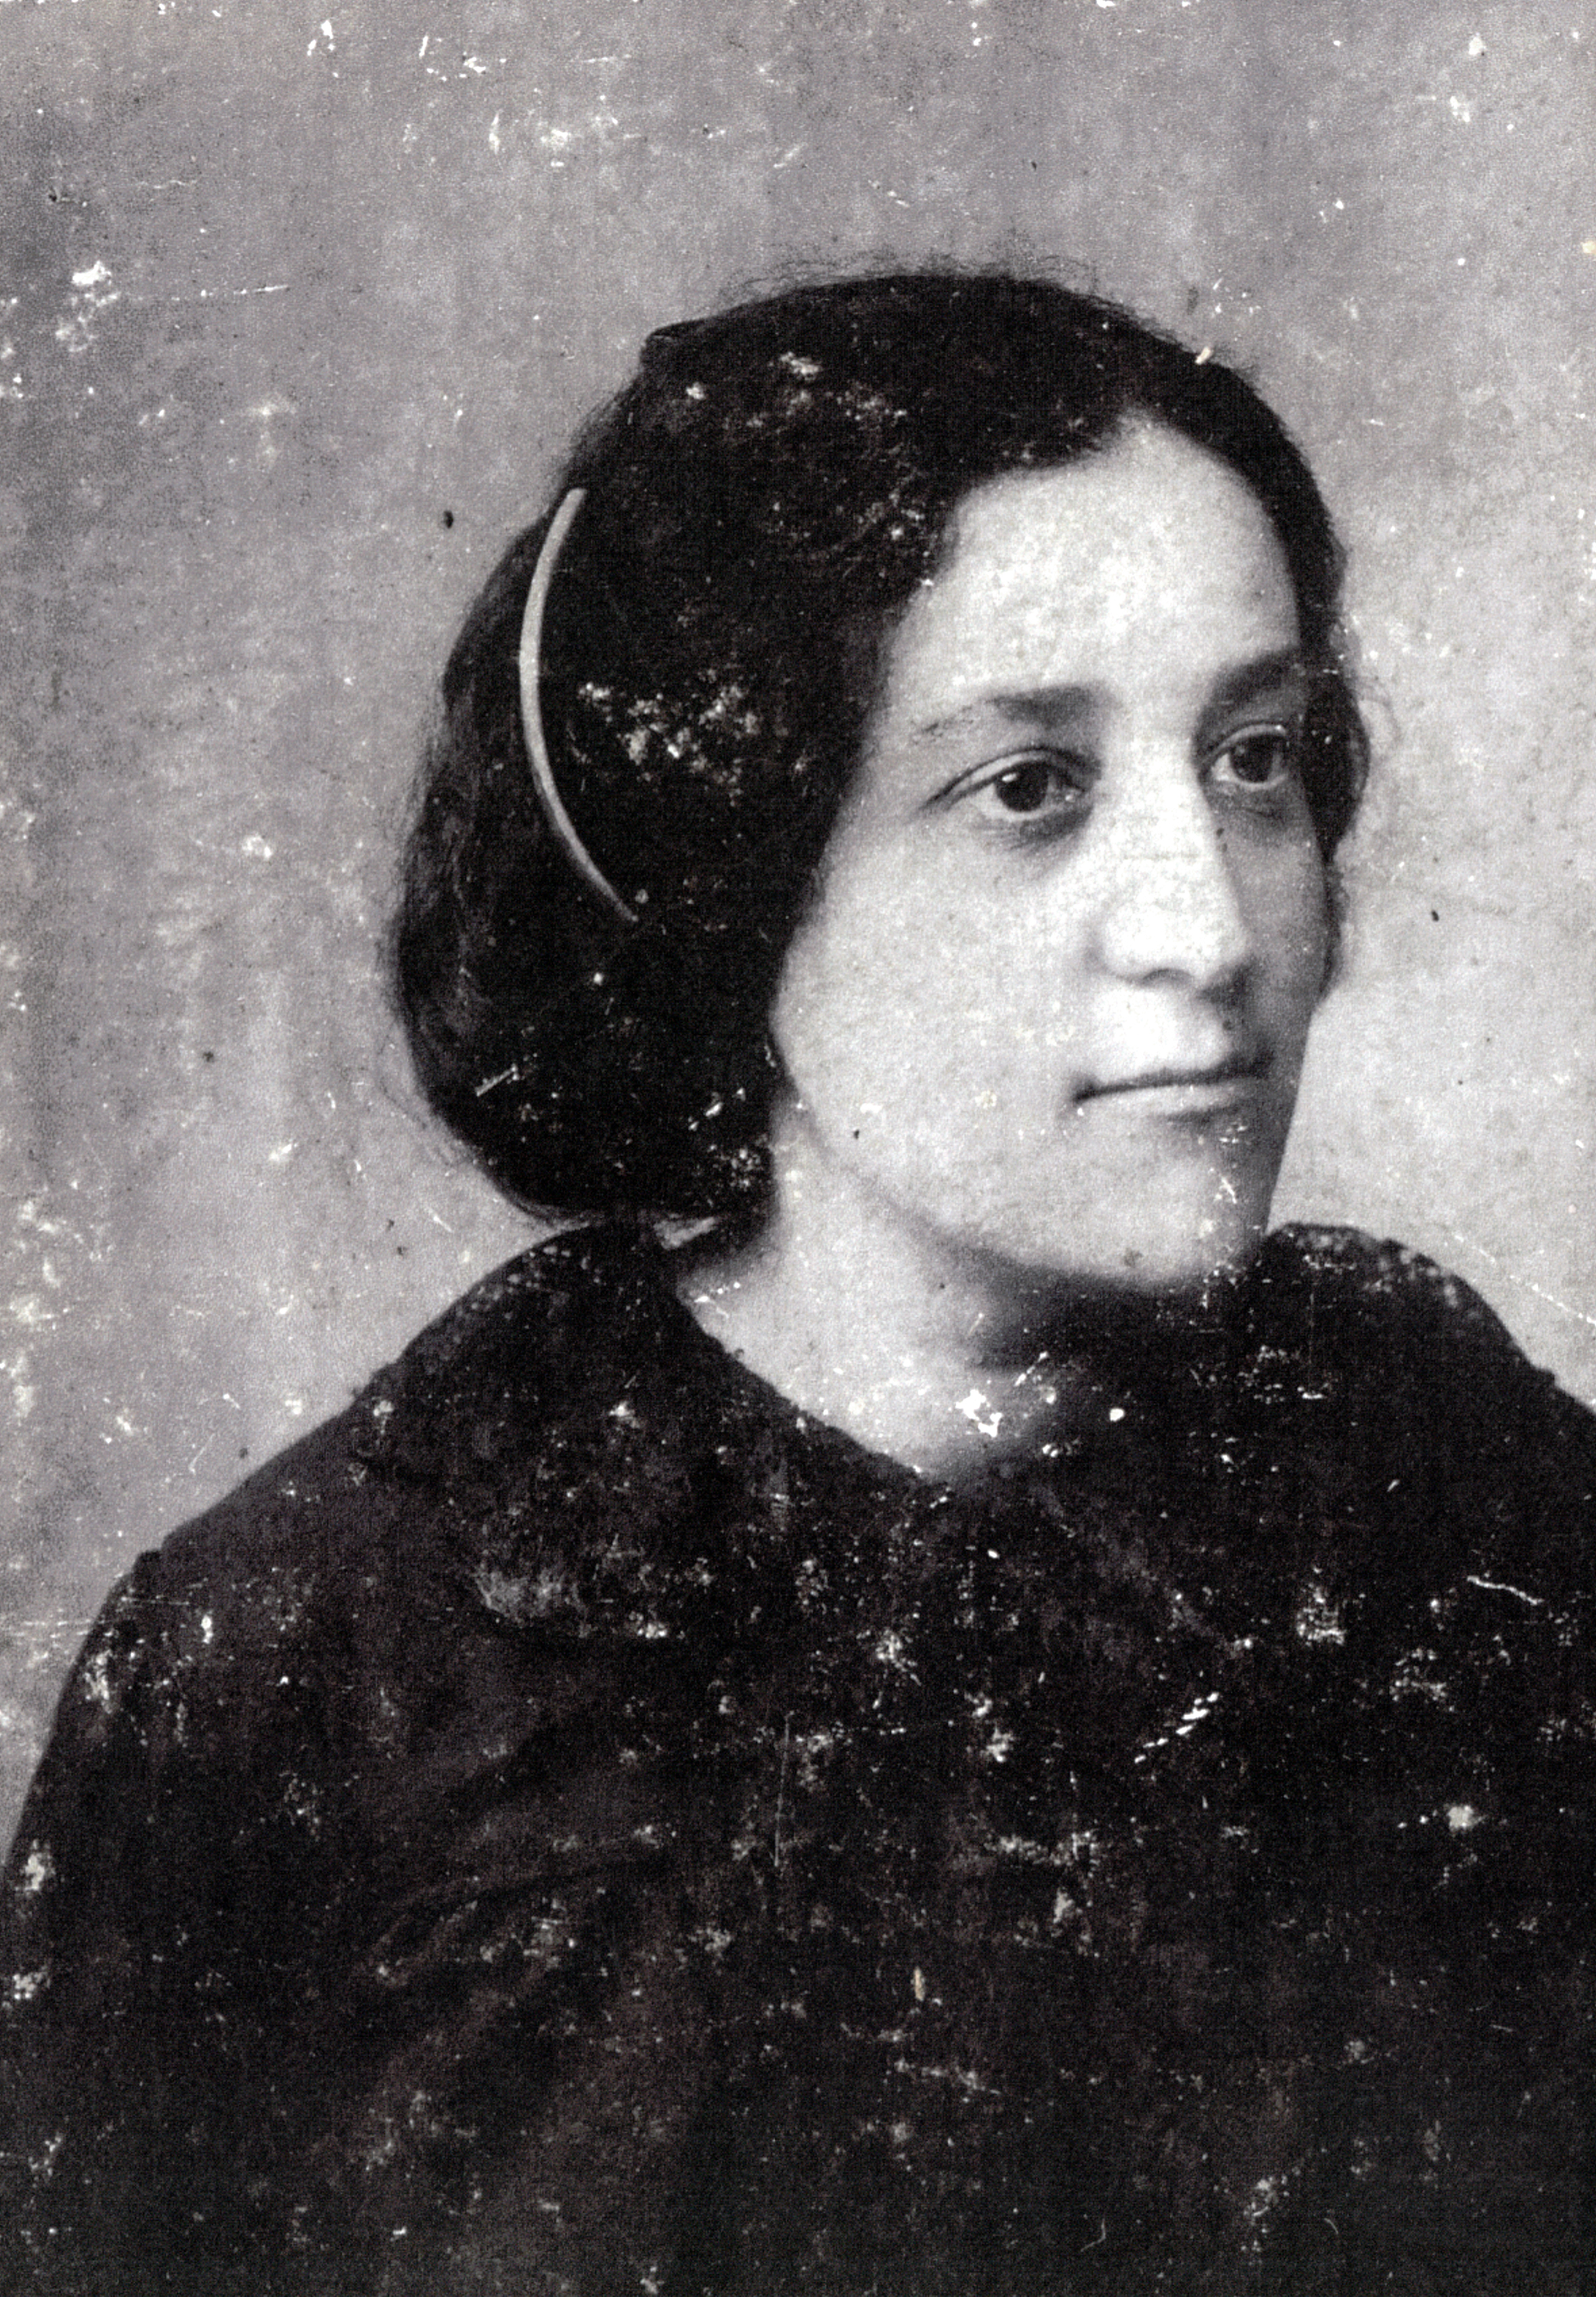 Rosa Gershenovich's mother Elizaveta Veltman